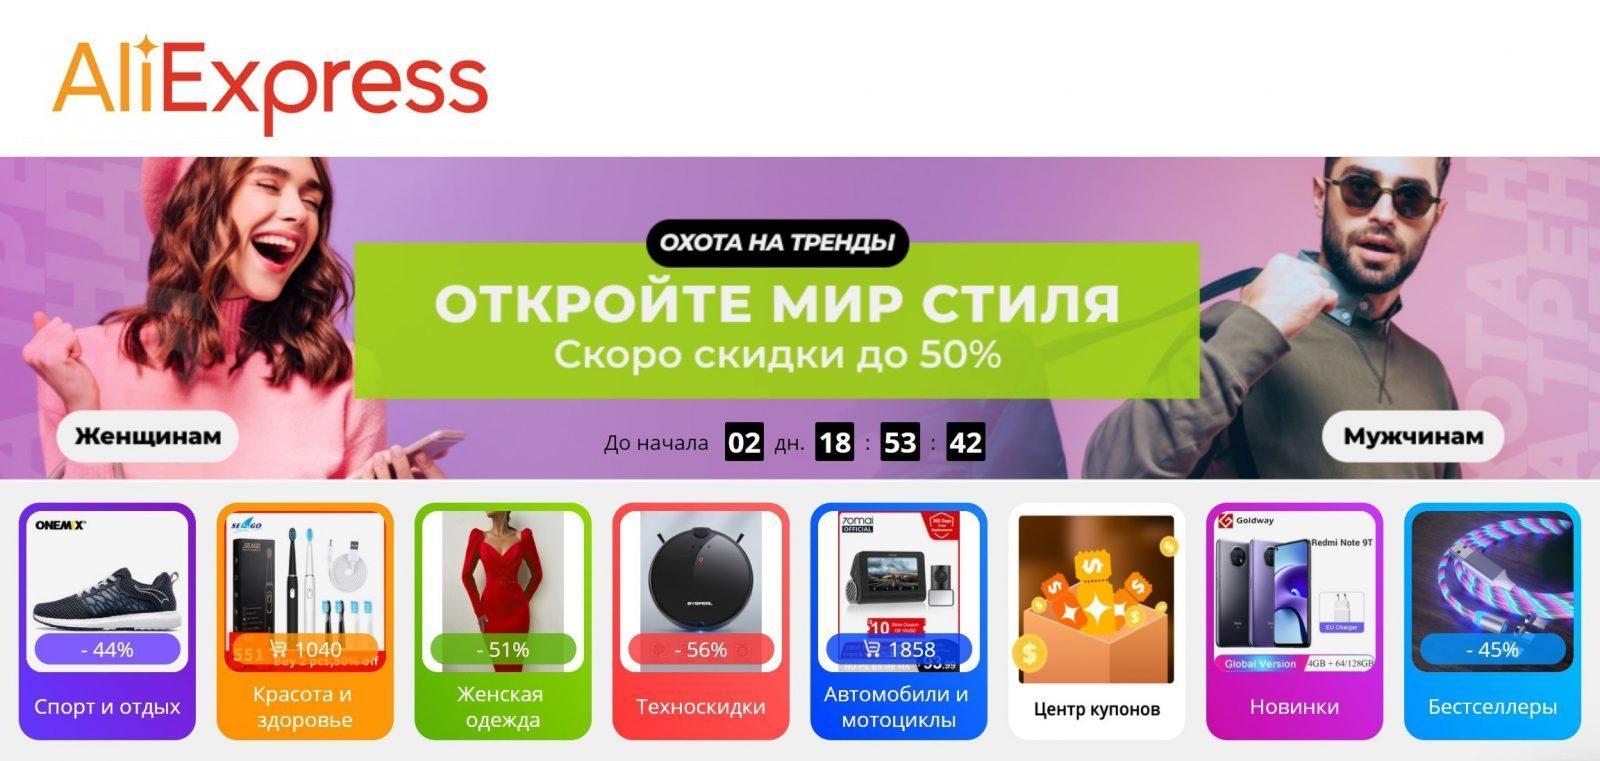 Анонс распродажи «Охота на тренды» на AliExpress